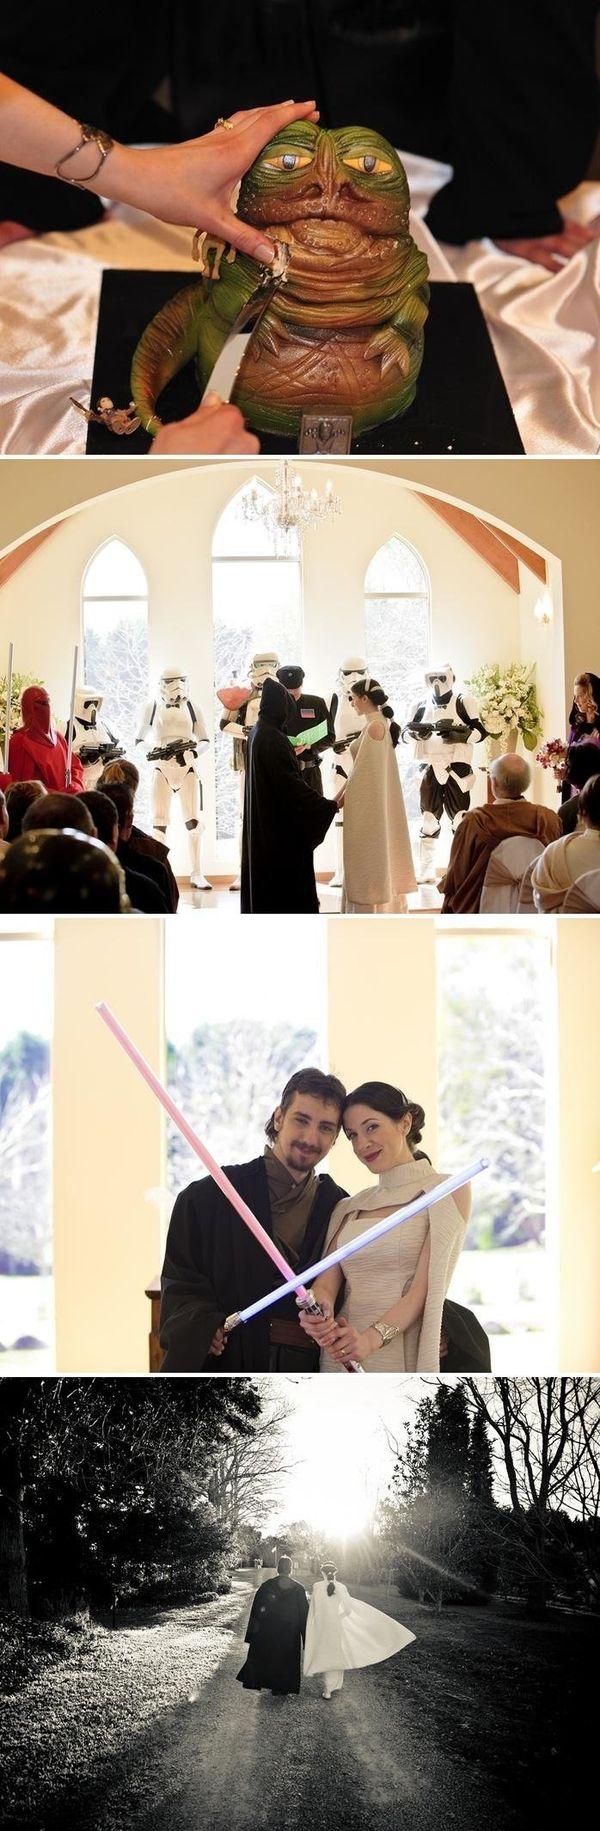 "<a href=""http://offbeatbride.com/2011/05/australian-star-wars-wedding"">Nadia and Dale</a> went <em>all in</em> on their <a hr"